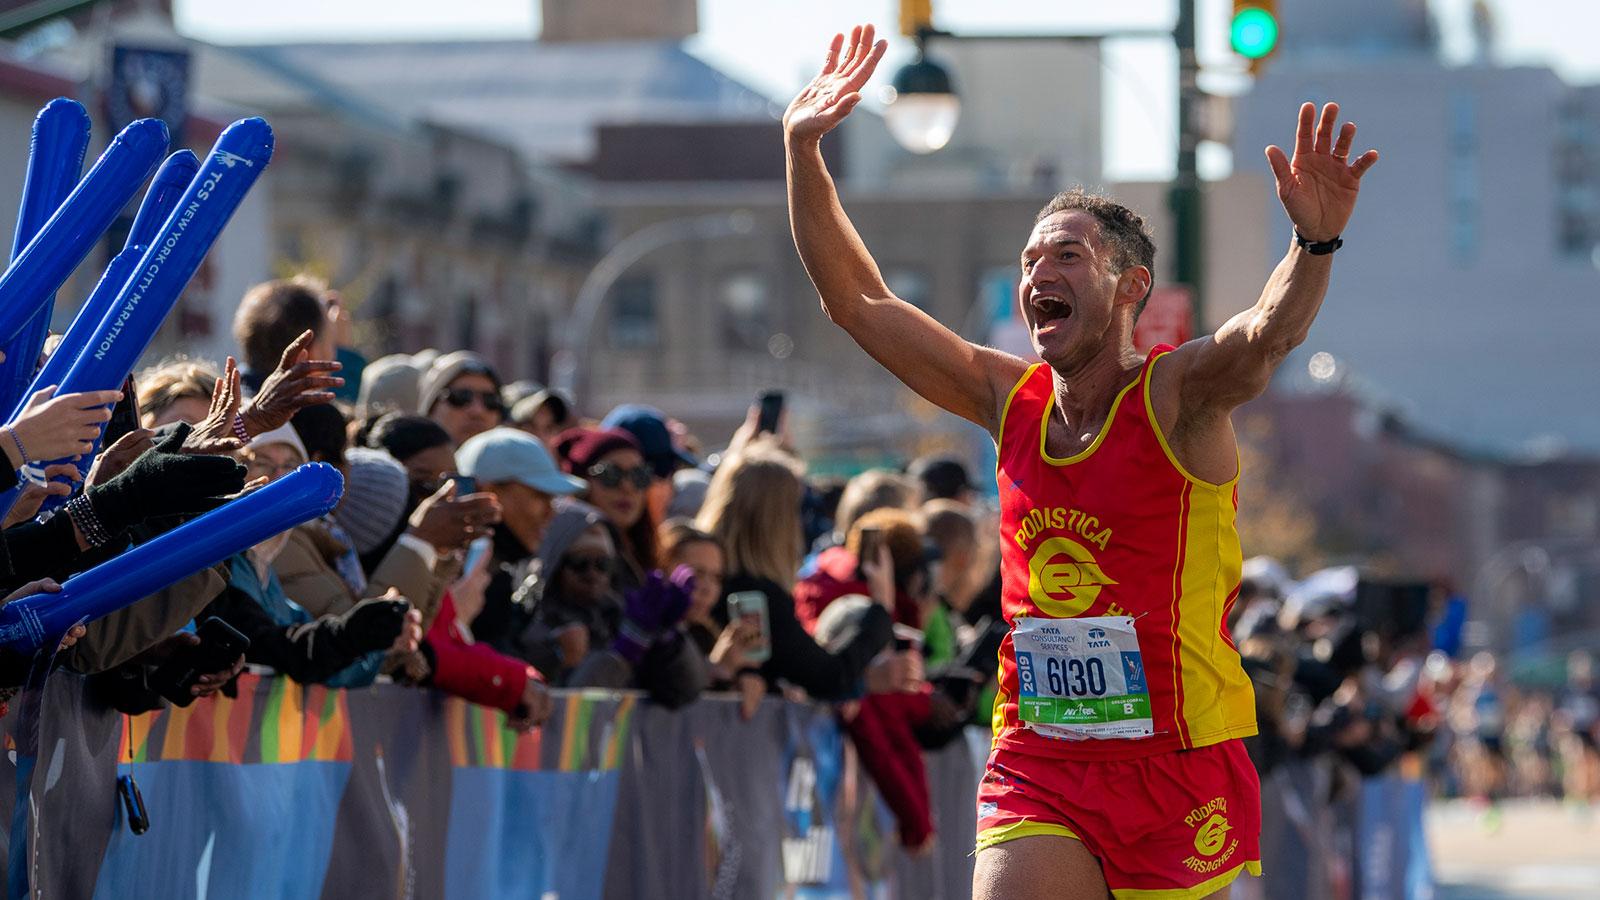 Runner and spectators at 2019 TCS New York City Marathon